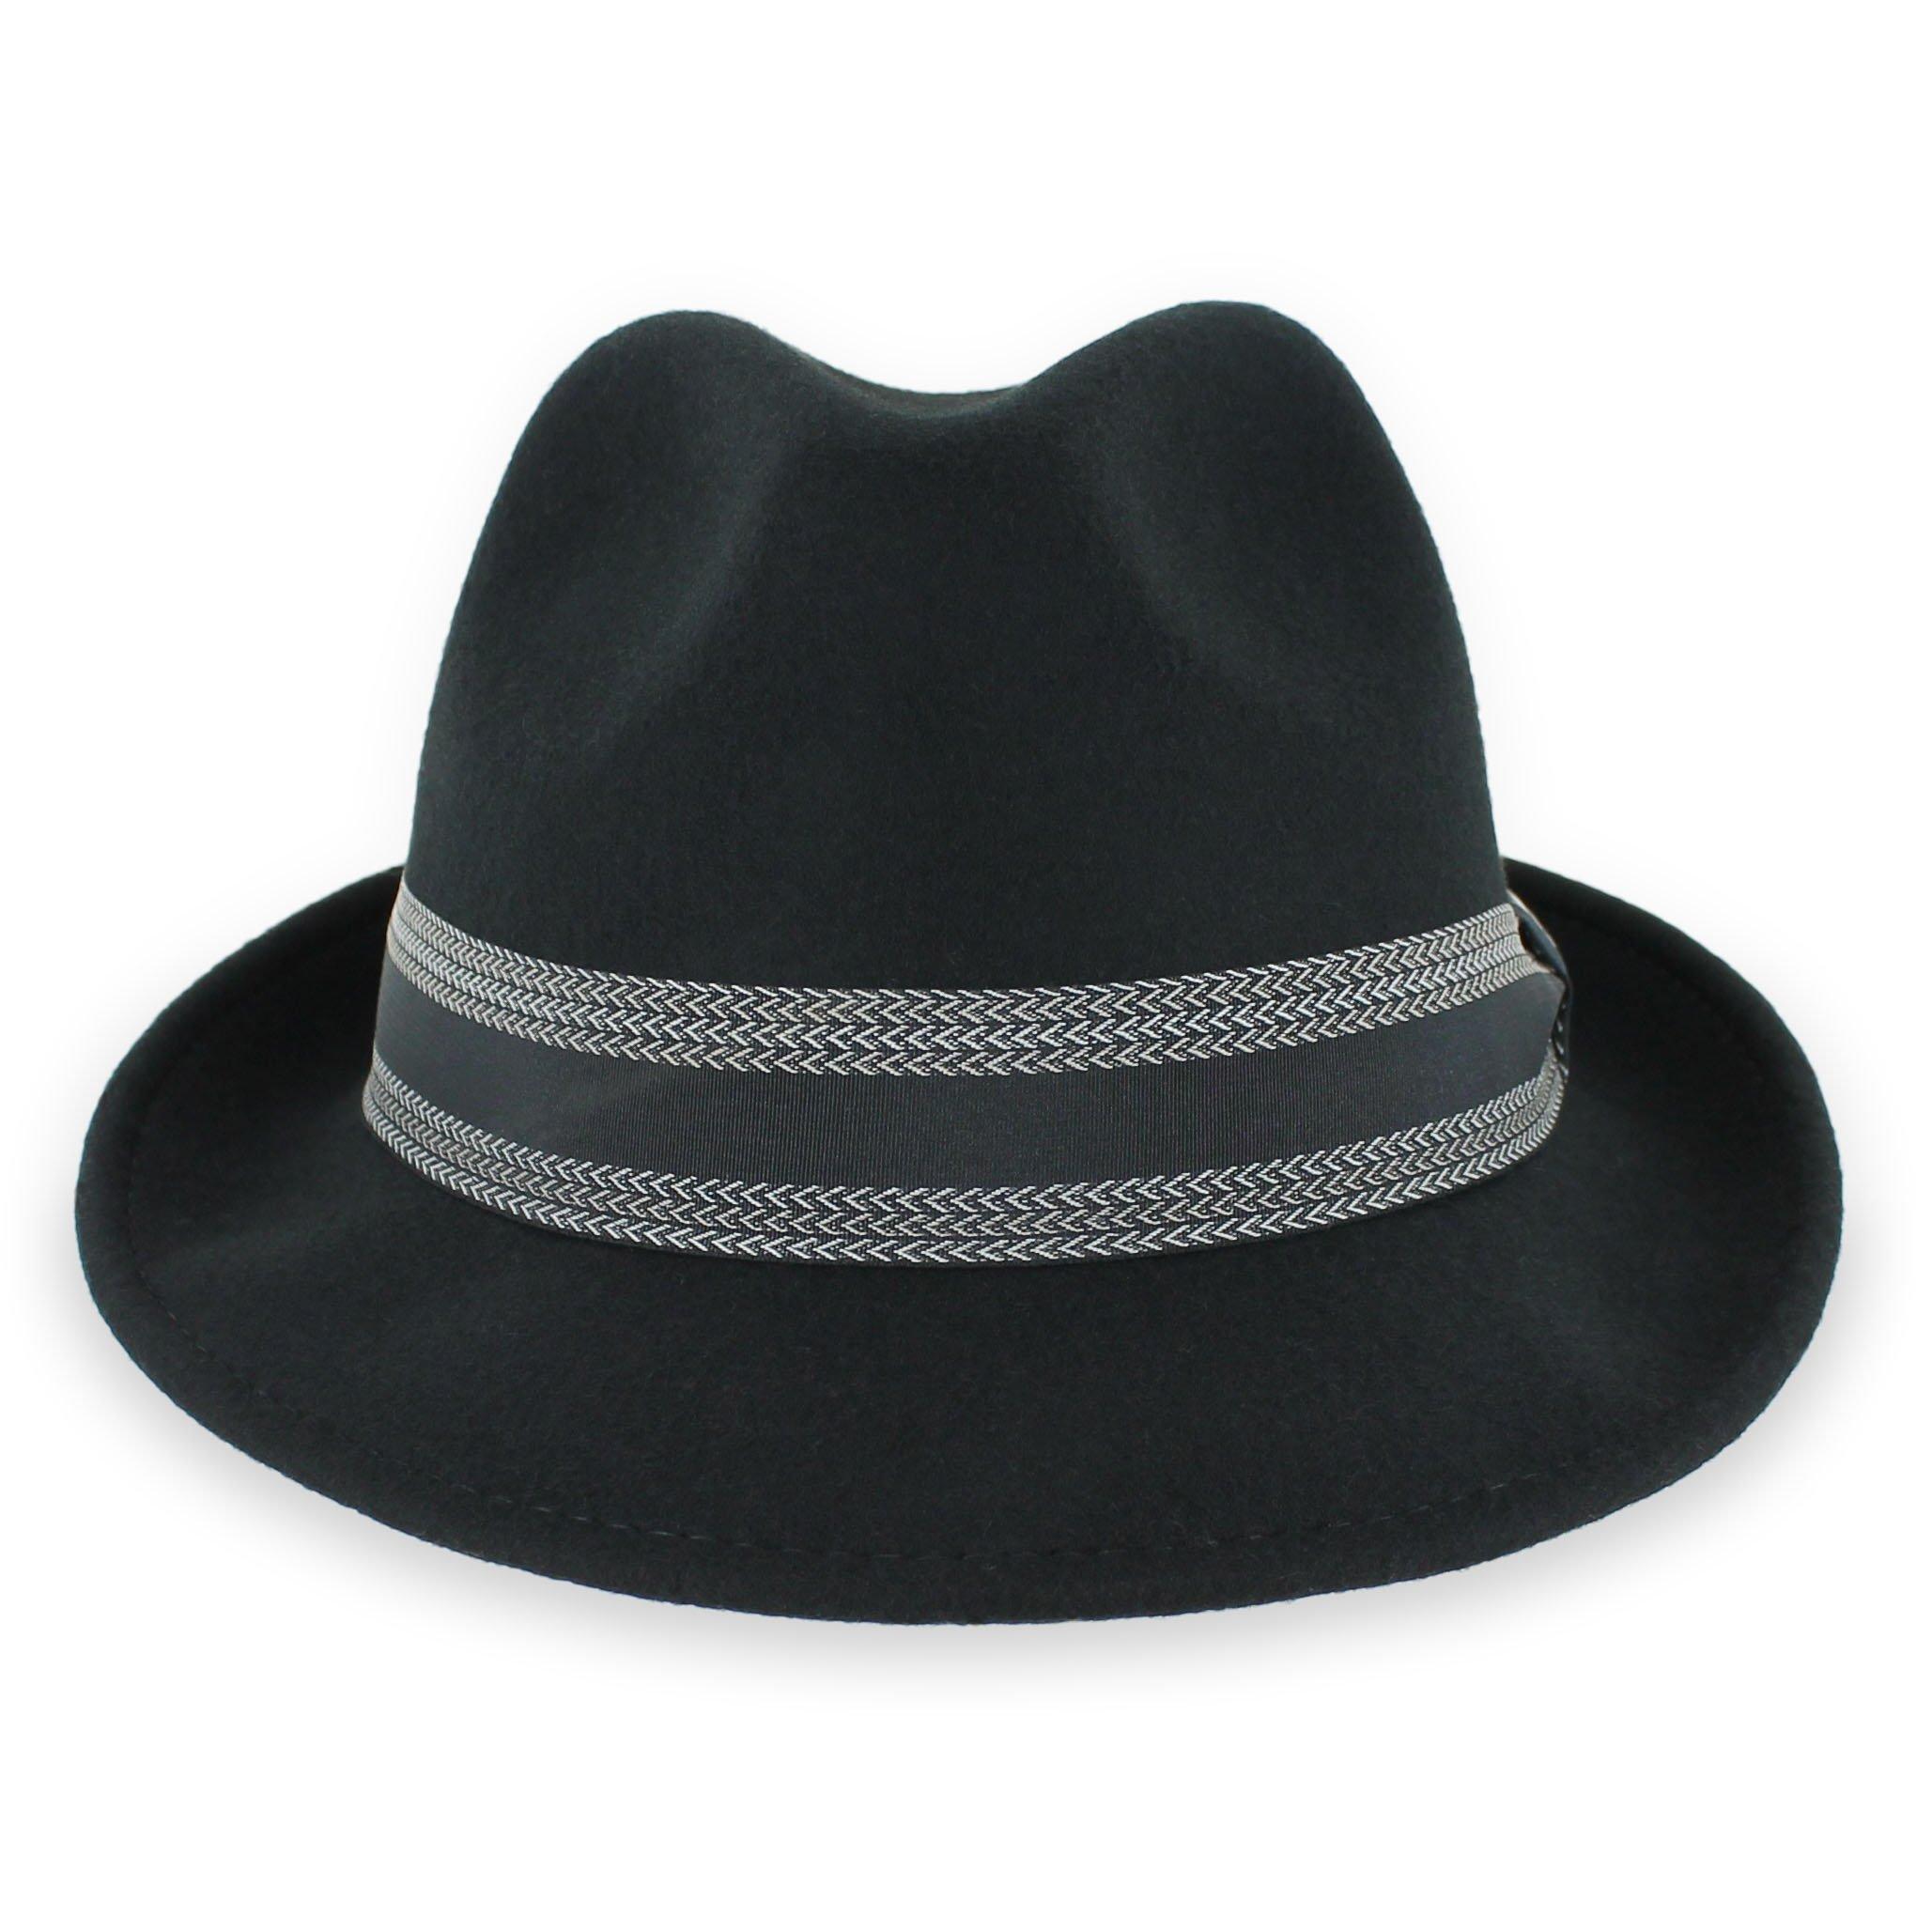 Hats in the Belfry Lucas - Crushable Wool Felt Fedora Hat (Black, XLarge)